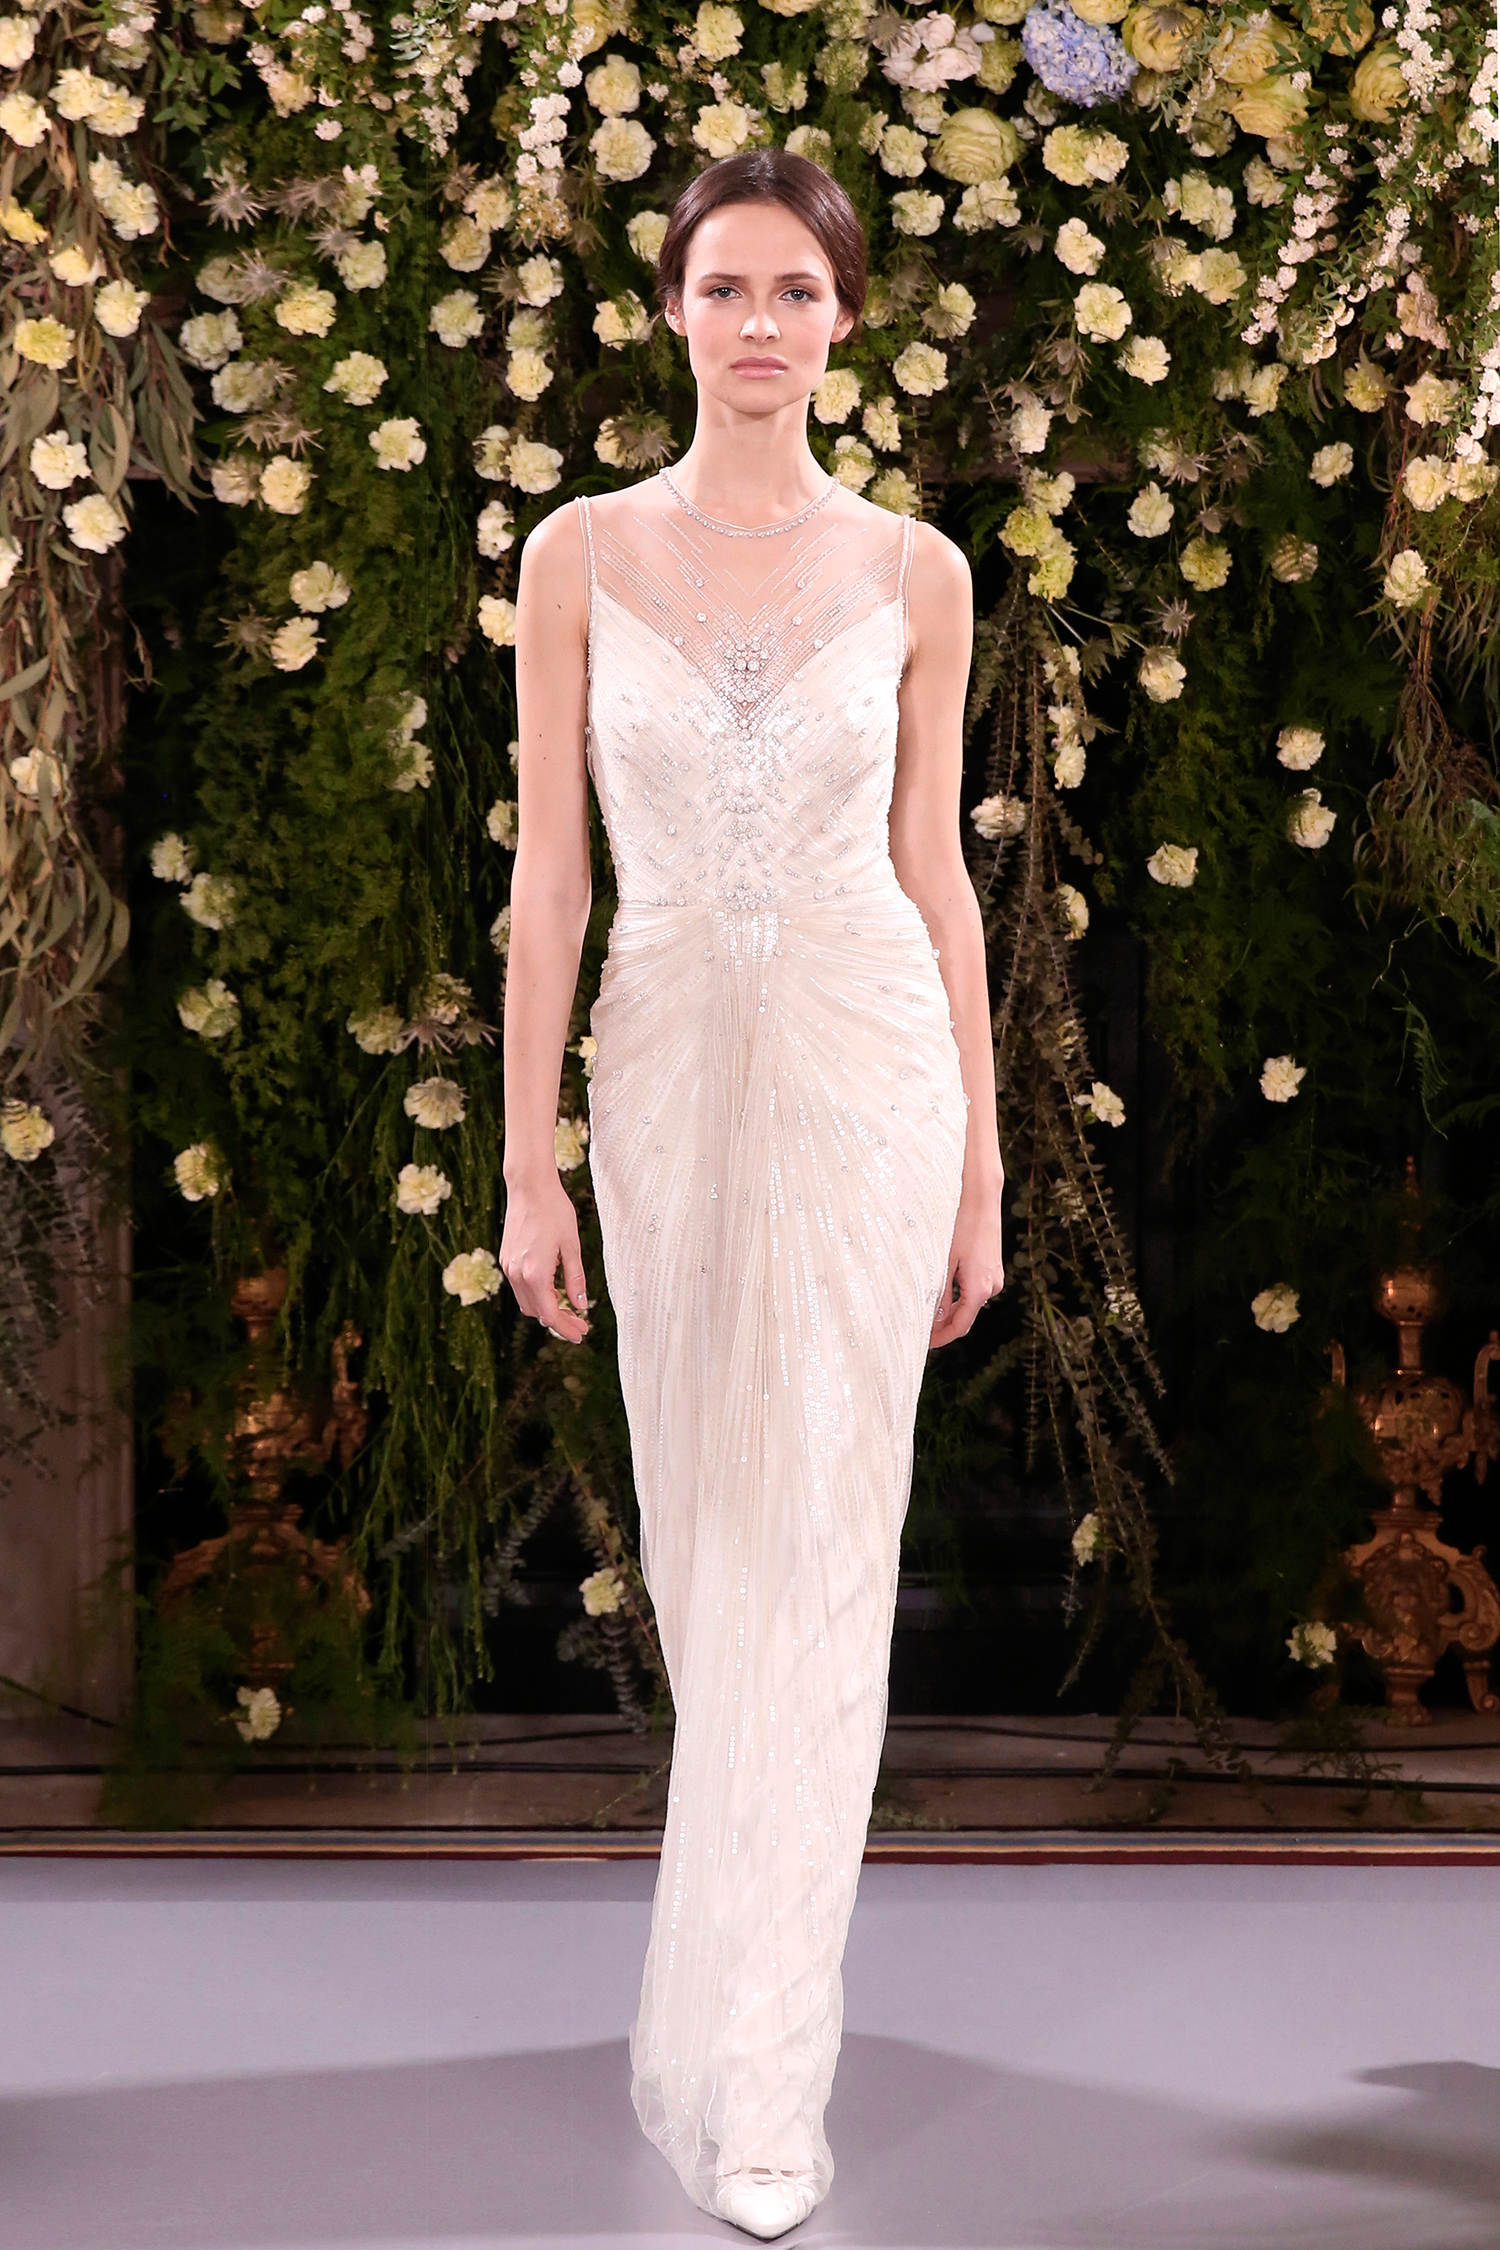 jenny packham wedding dress spring 2019 illusion neck with beadwork